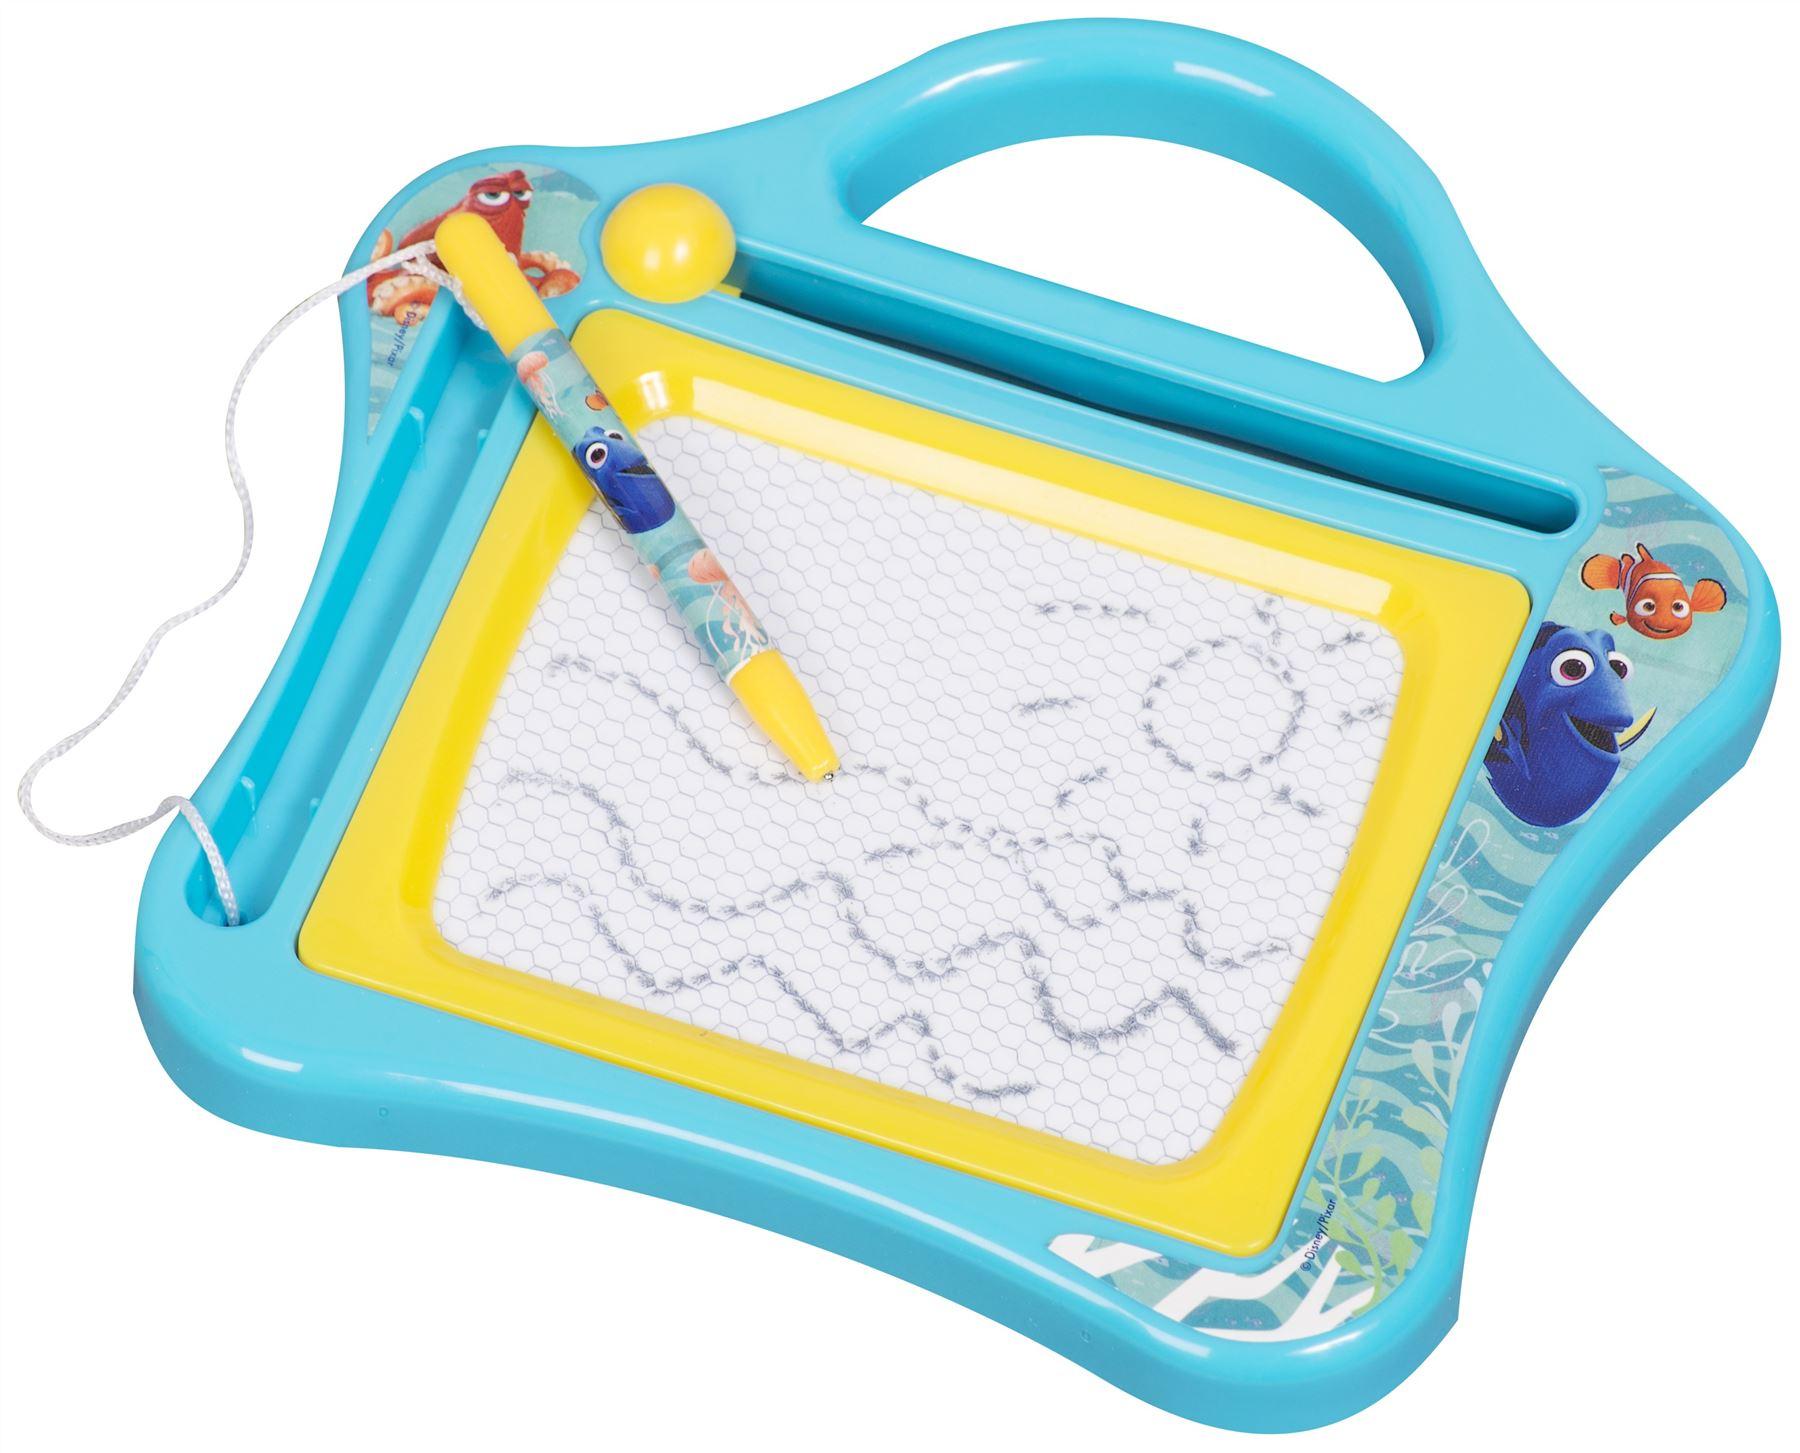 disney childrens kids small scribbler etch a sketch magnetic drawing board toys ebay. Black Bedroom Furniture Sets. Home Design Ideas